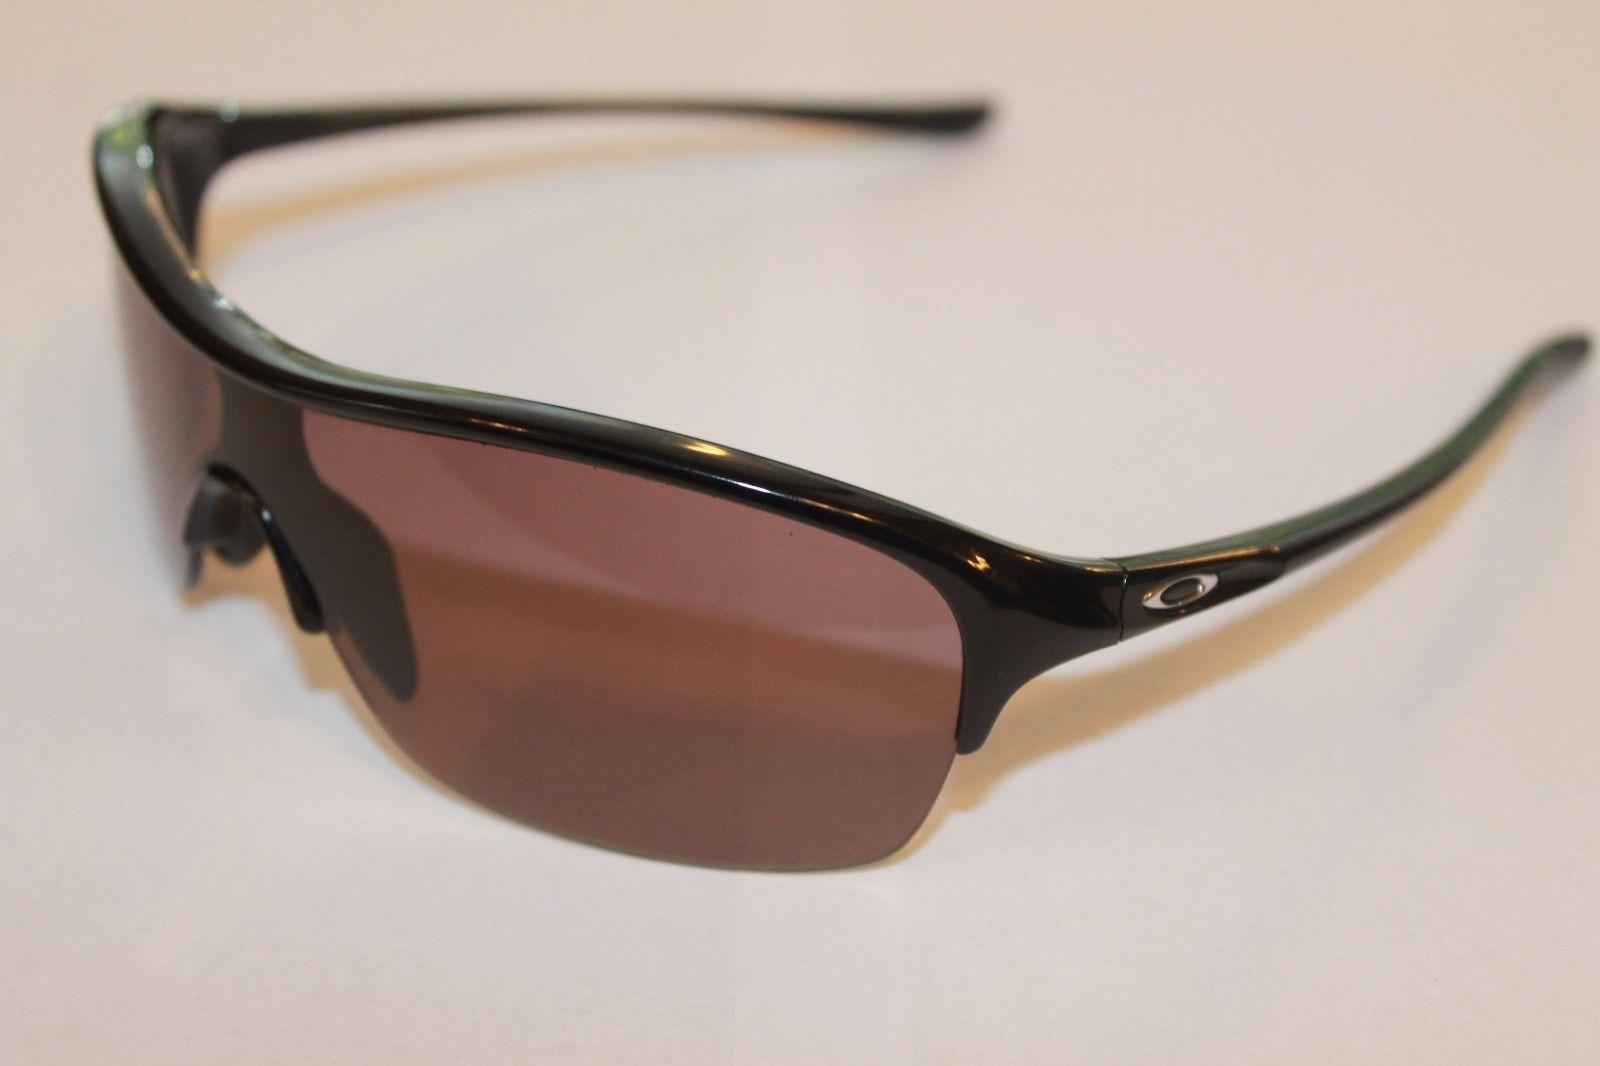 672b7f360e9 Oakley Unstoppable Women s Sunglasses Polarized